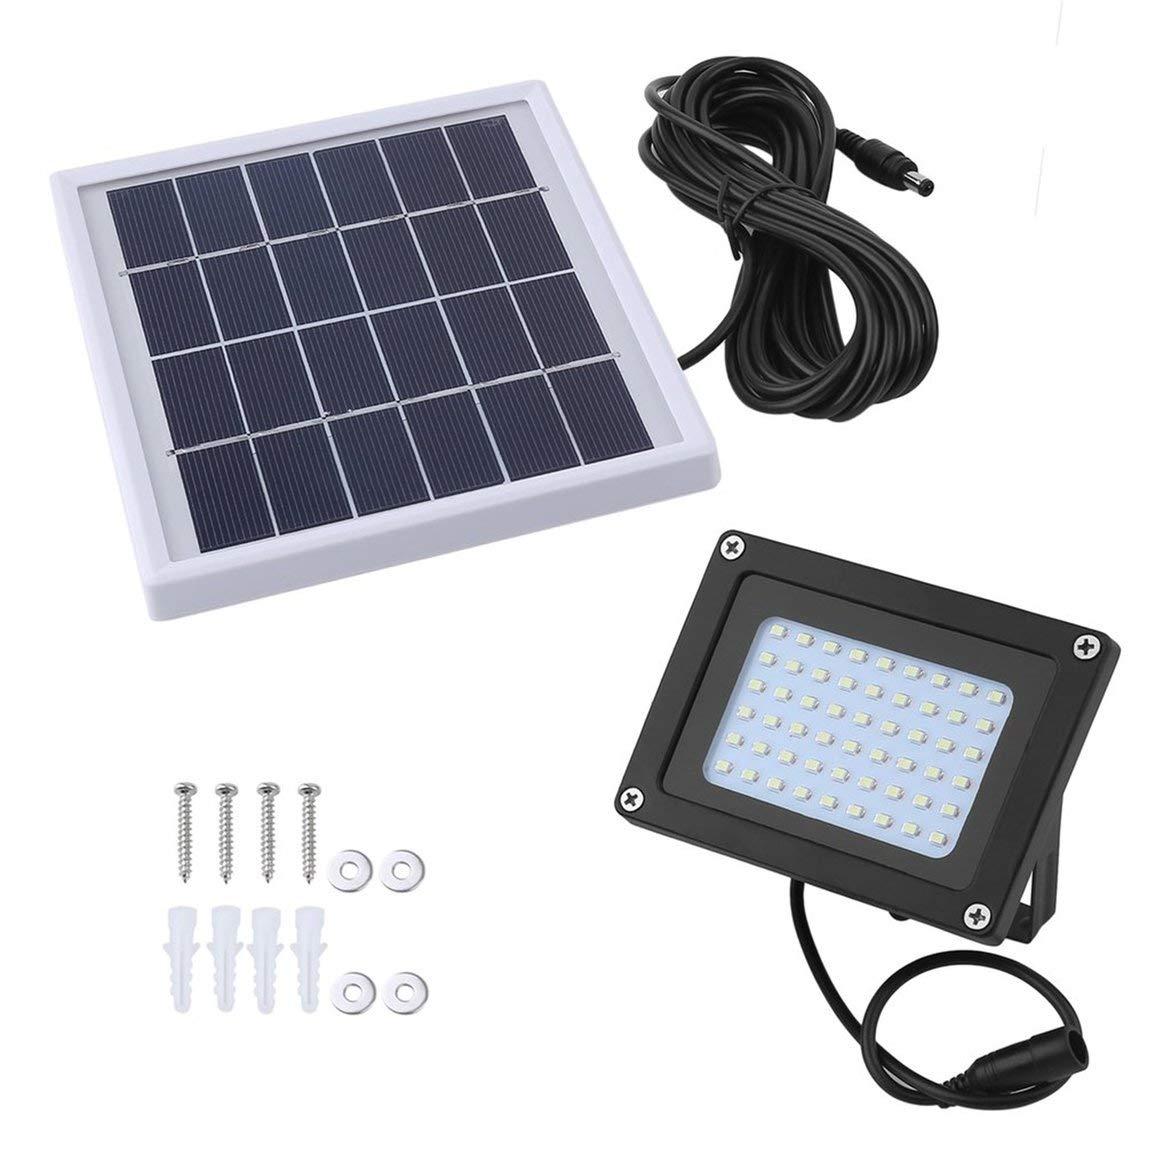 54 LED Solar Powered Light Outdoor Security Impermeabile Prato Light Sensor Flood Spot Lampada per cortile giardino Patio JBP-X